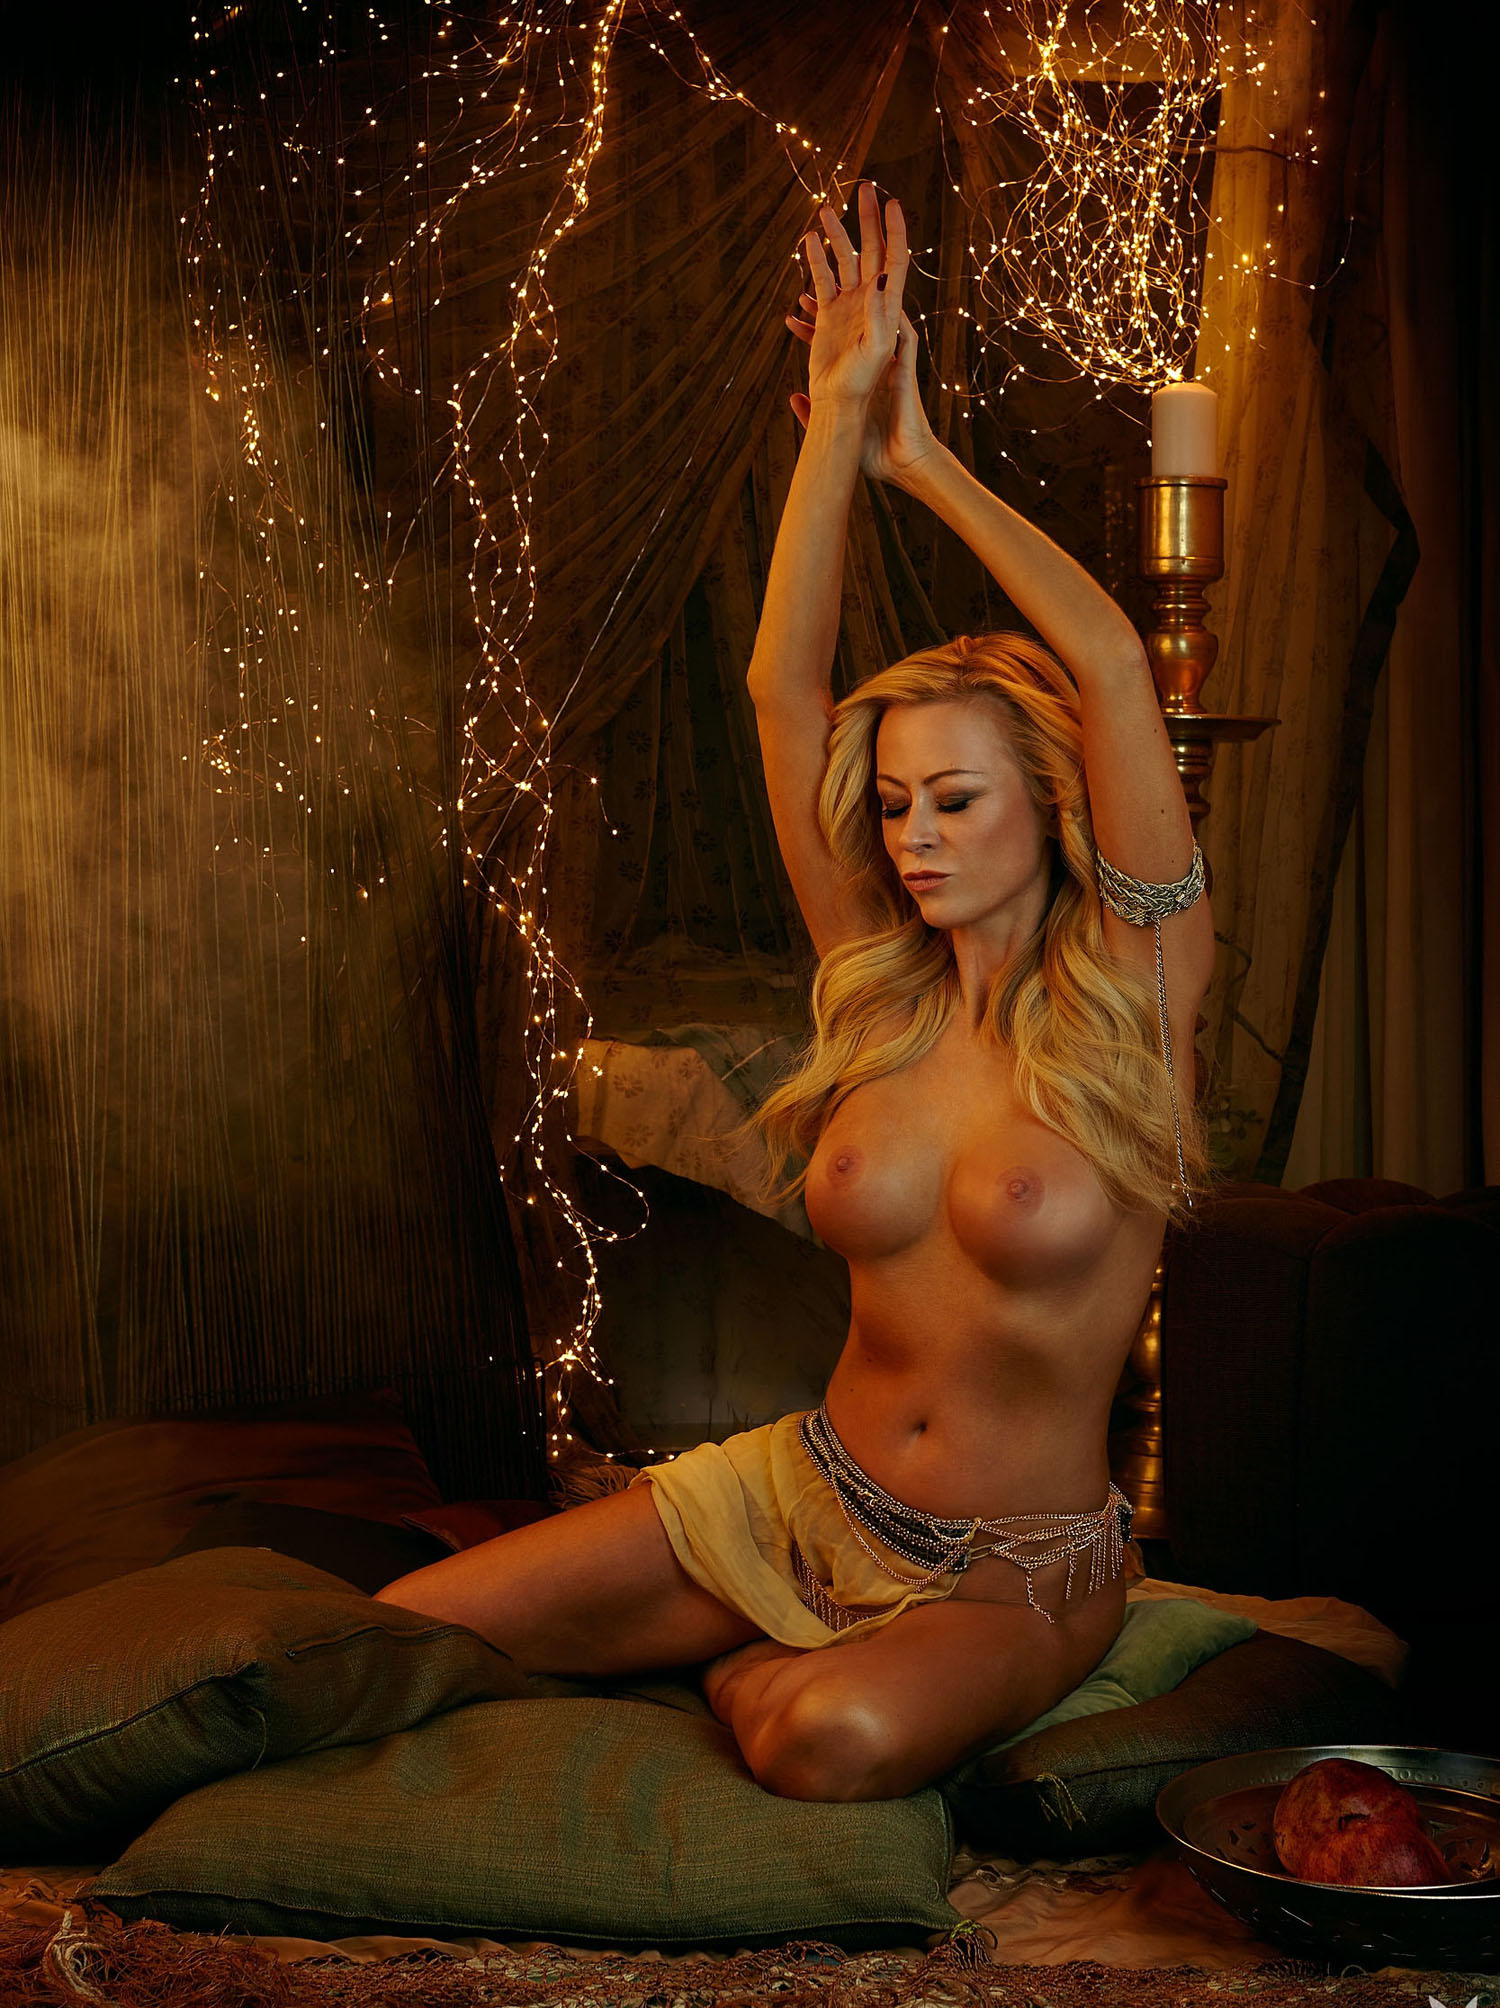 Дженни Элверс голая. Фото - 14